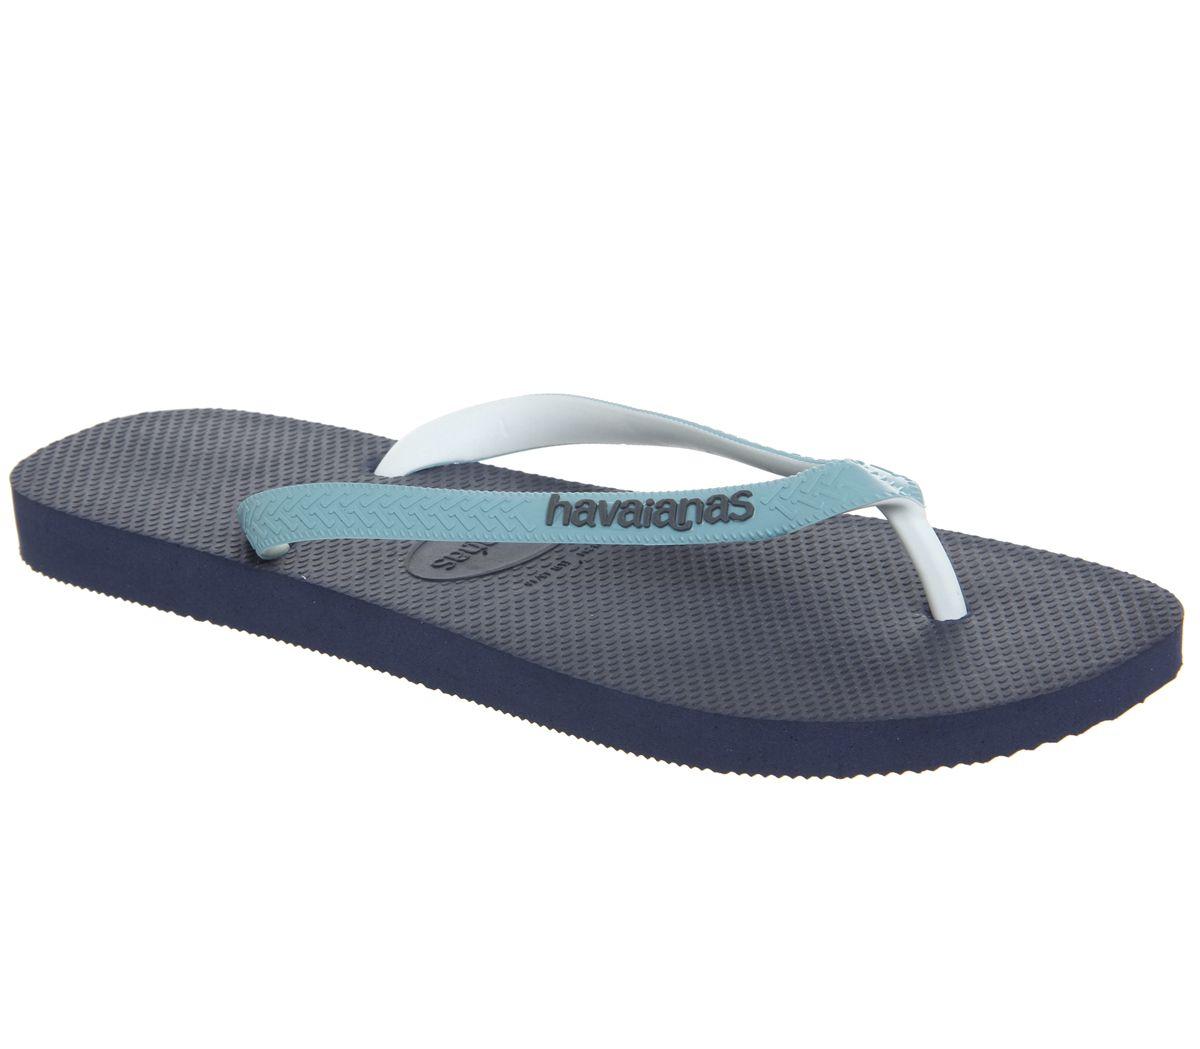 b4a7c838f Havaianas Havaianas Top Mix Flip Flops Navy Aqua - Sandals